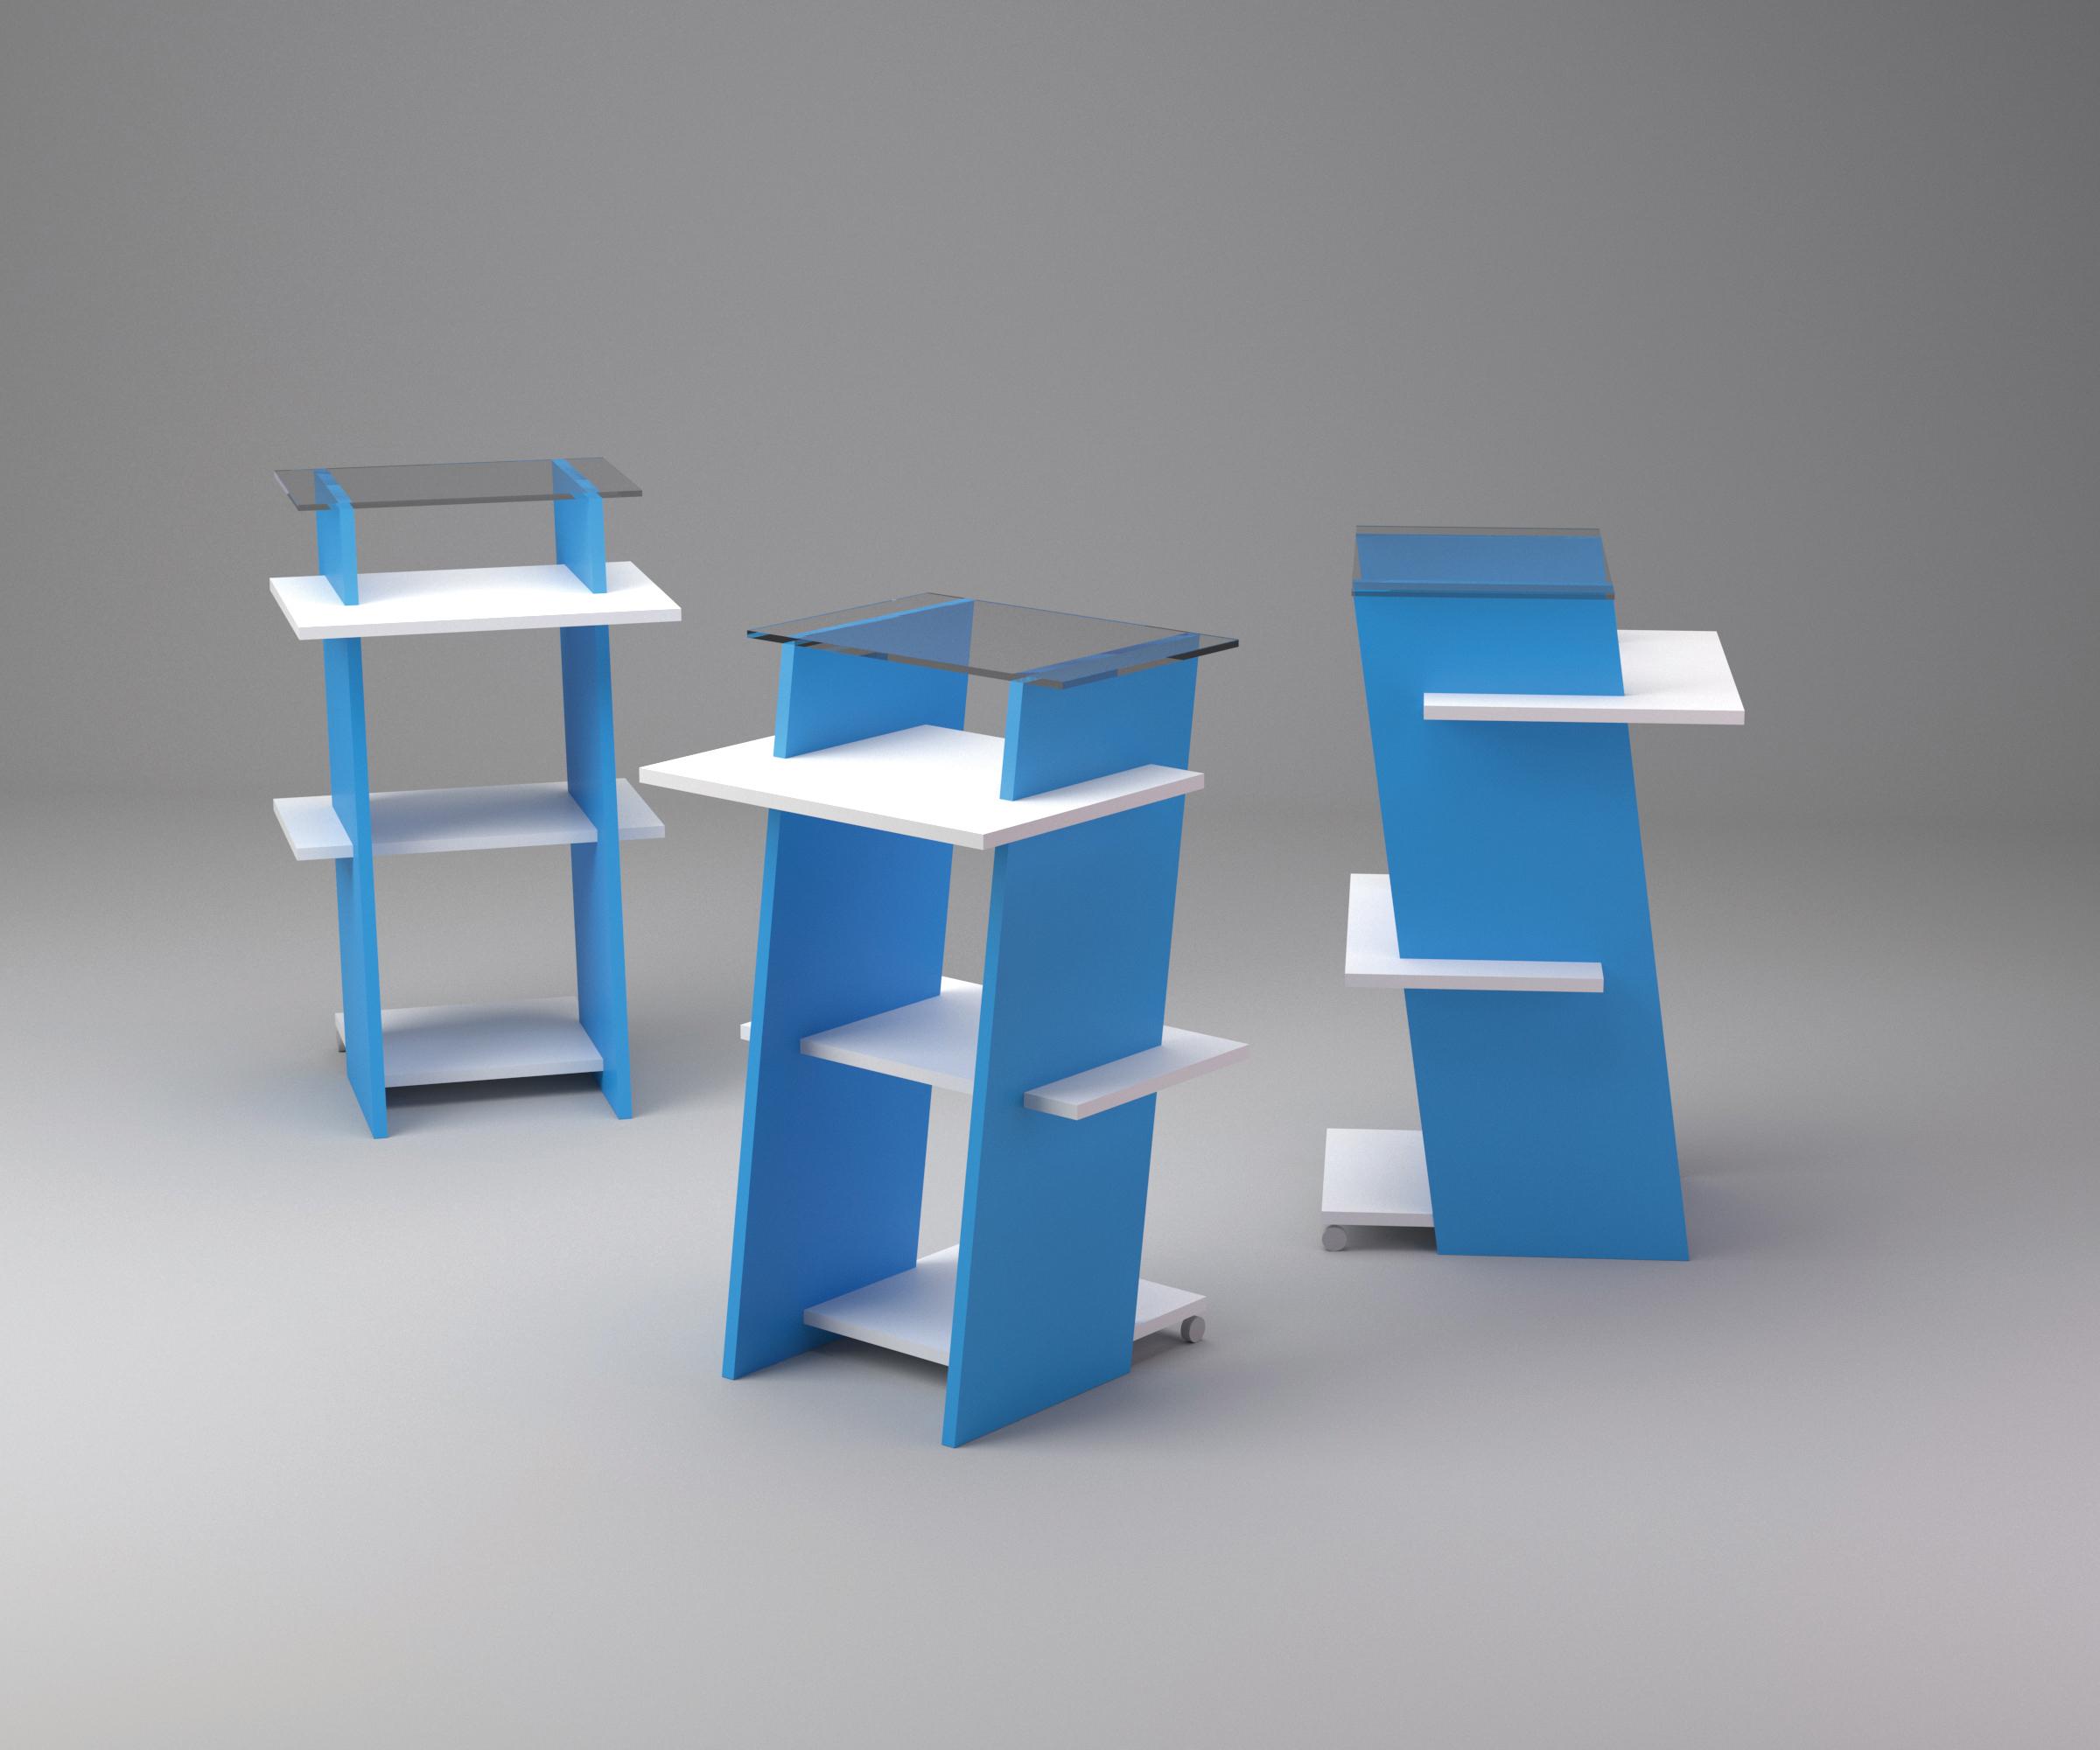 Knauf products - Knauf table - Knauf Shop